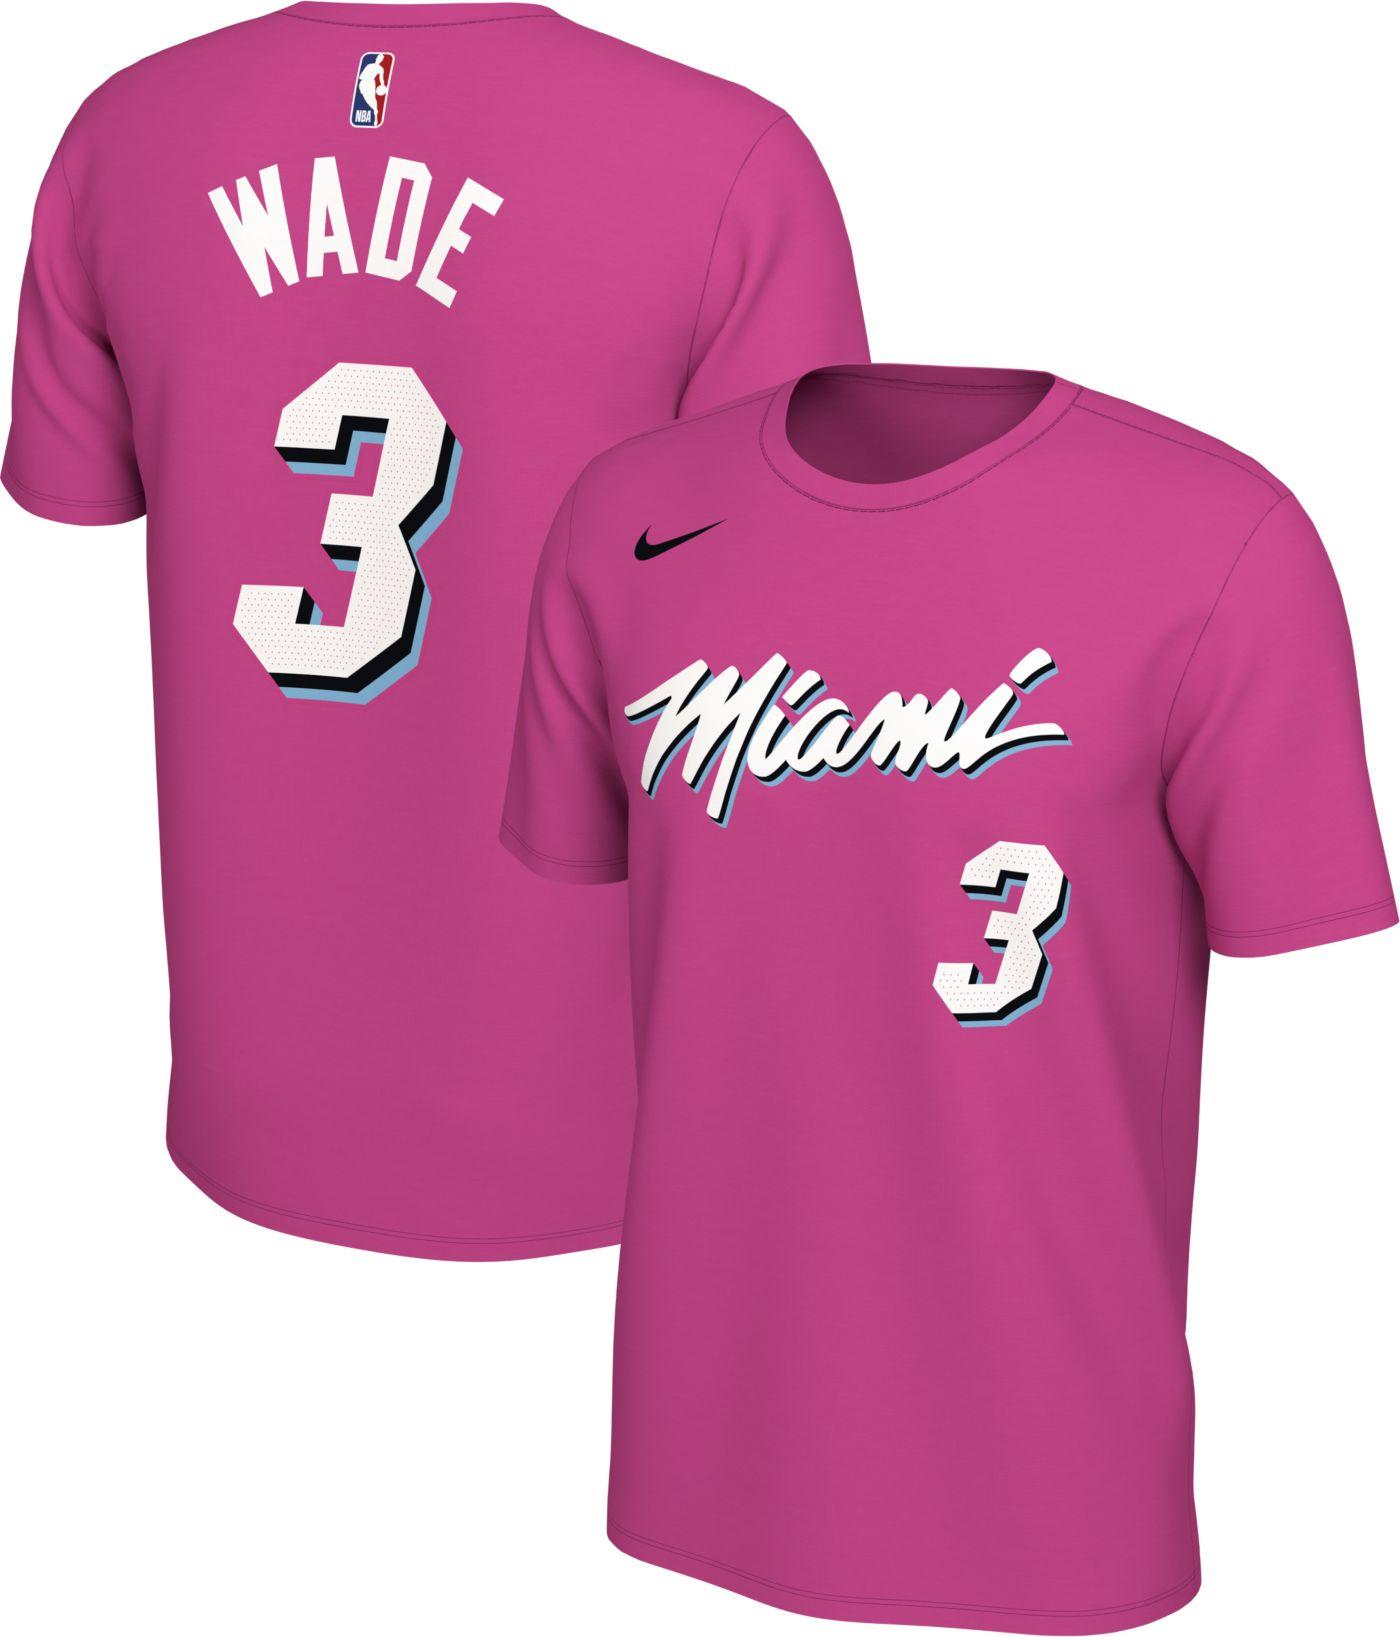 Nike Men's Miami Heat Dwyane Wade Dri-FIT Earned Edition T-Shirt